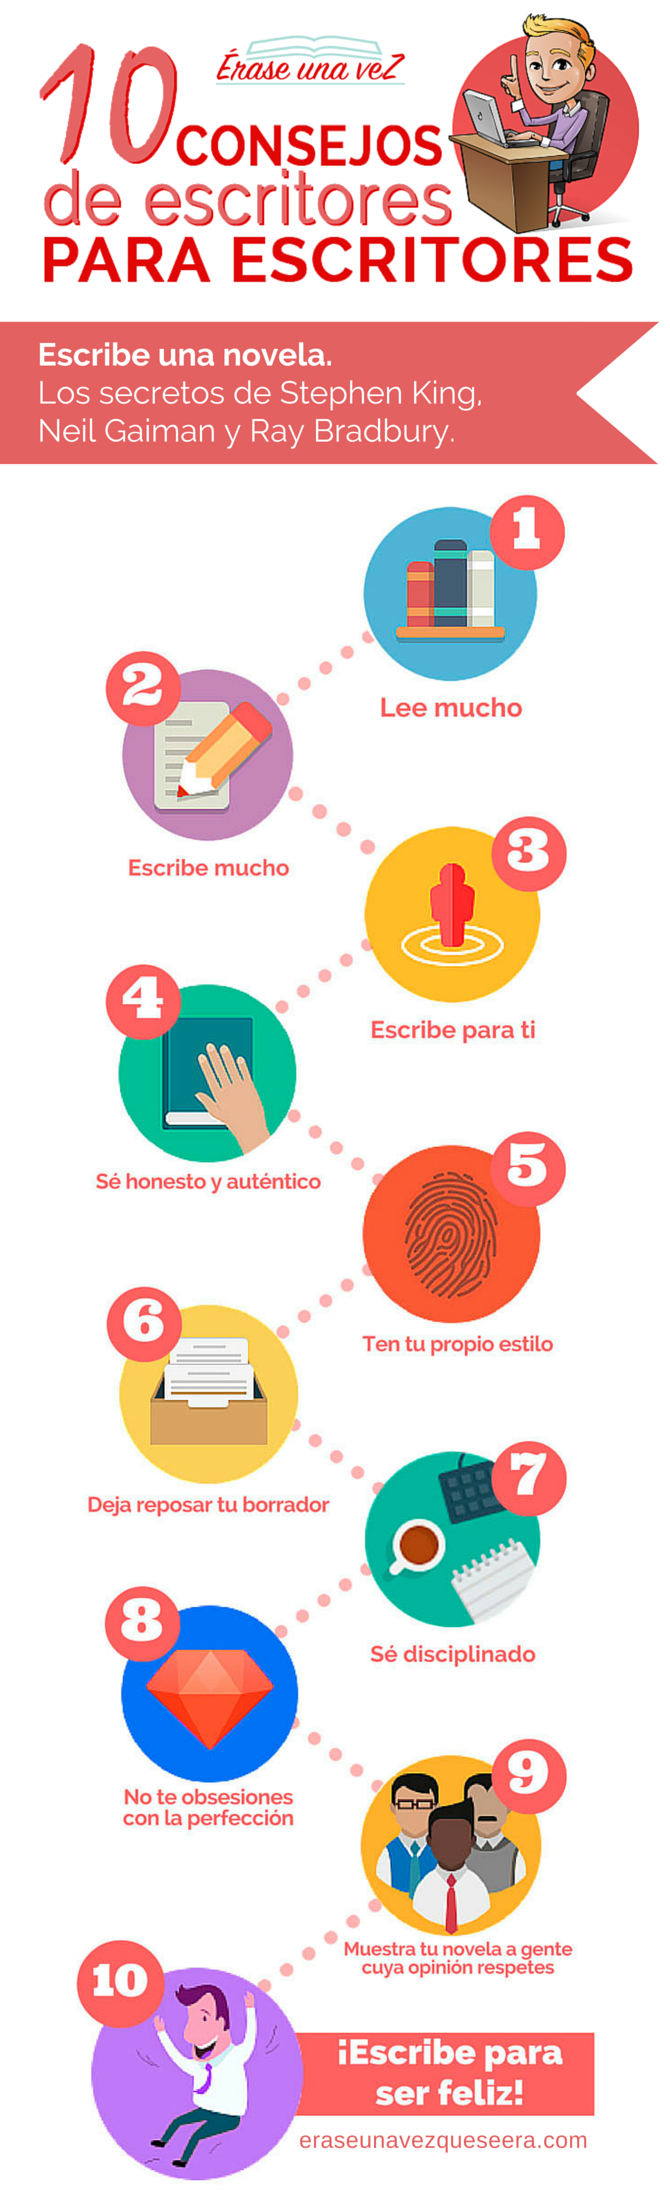 Infografía: 10 consejos de escritores para escritores